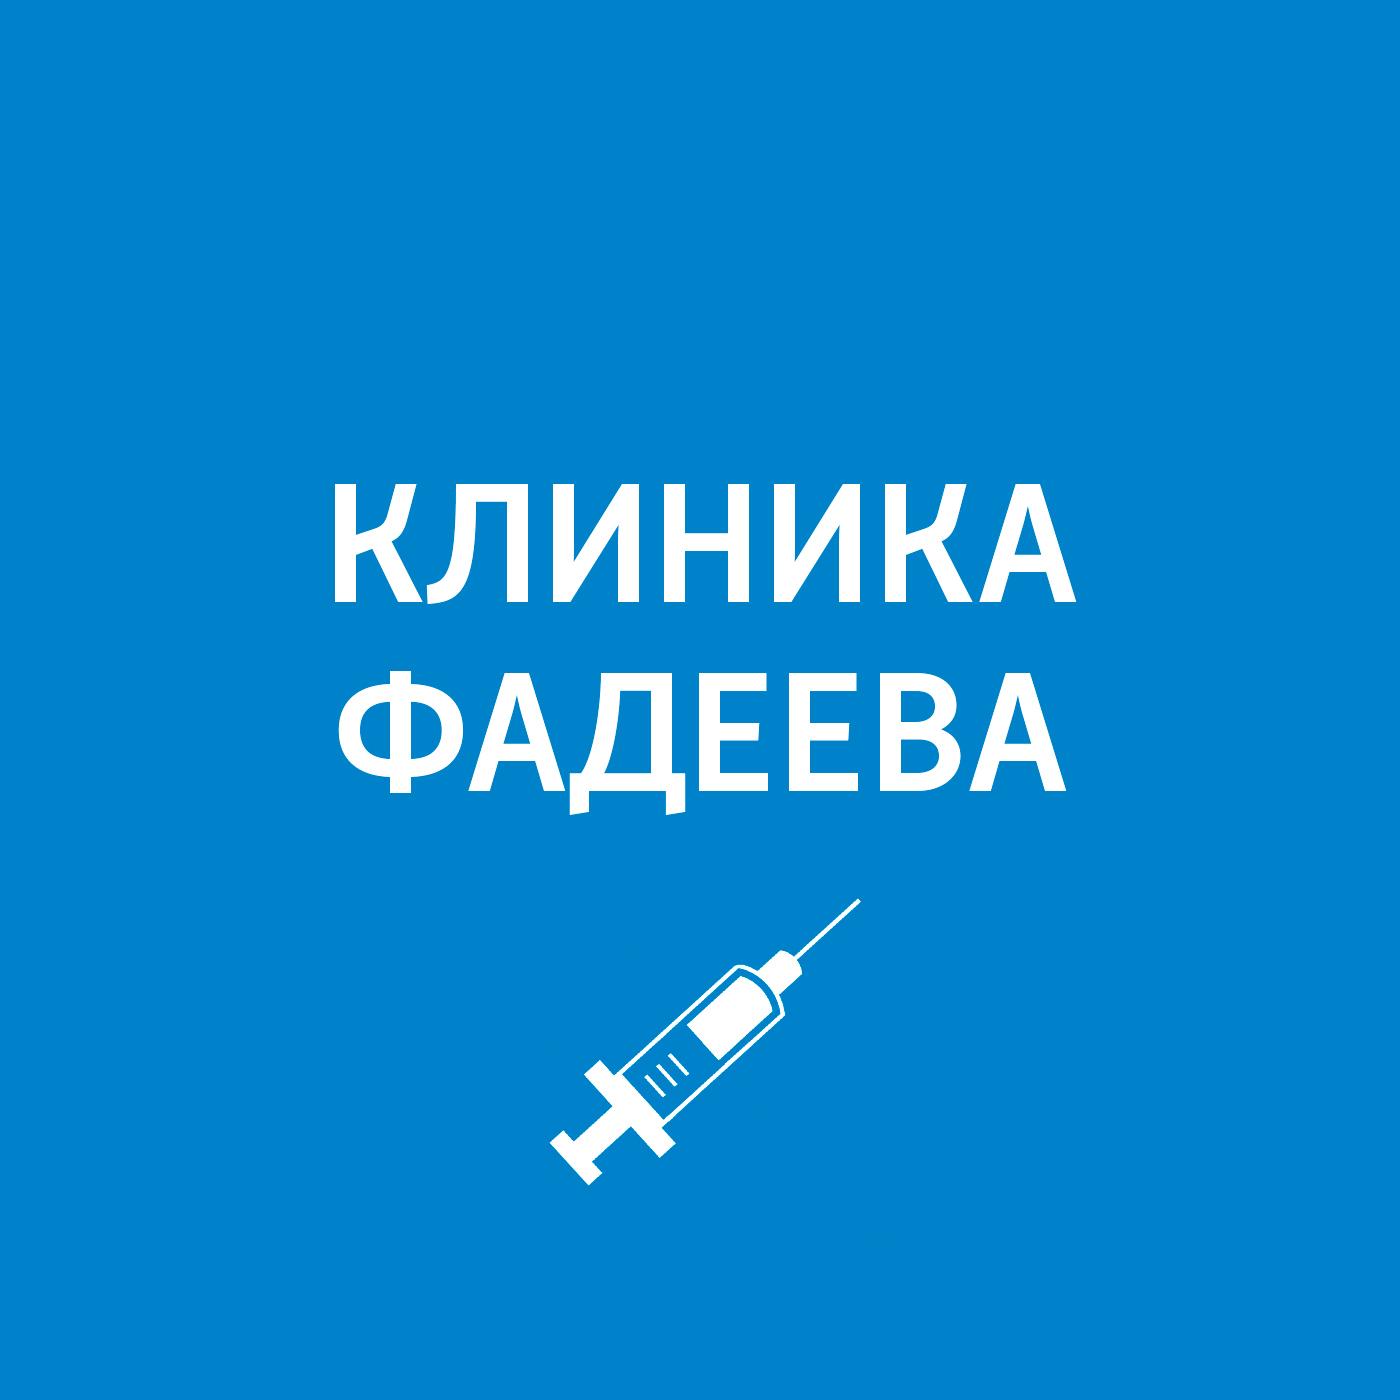 Пётр Фадеев Мотогонки